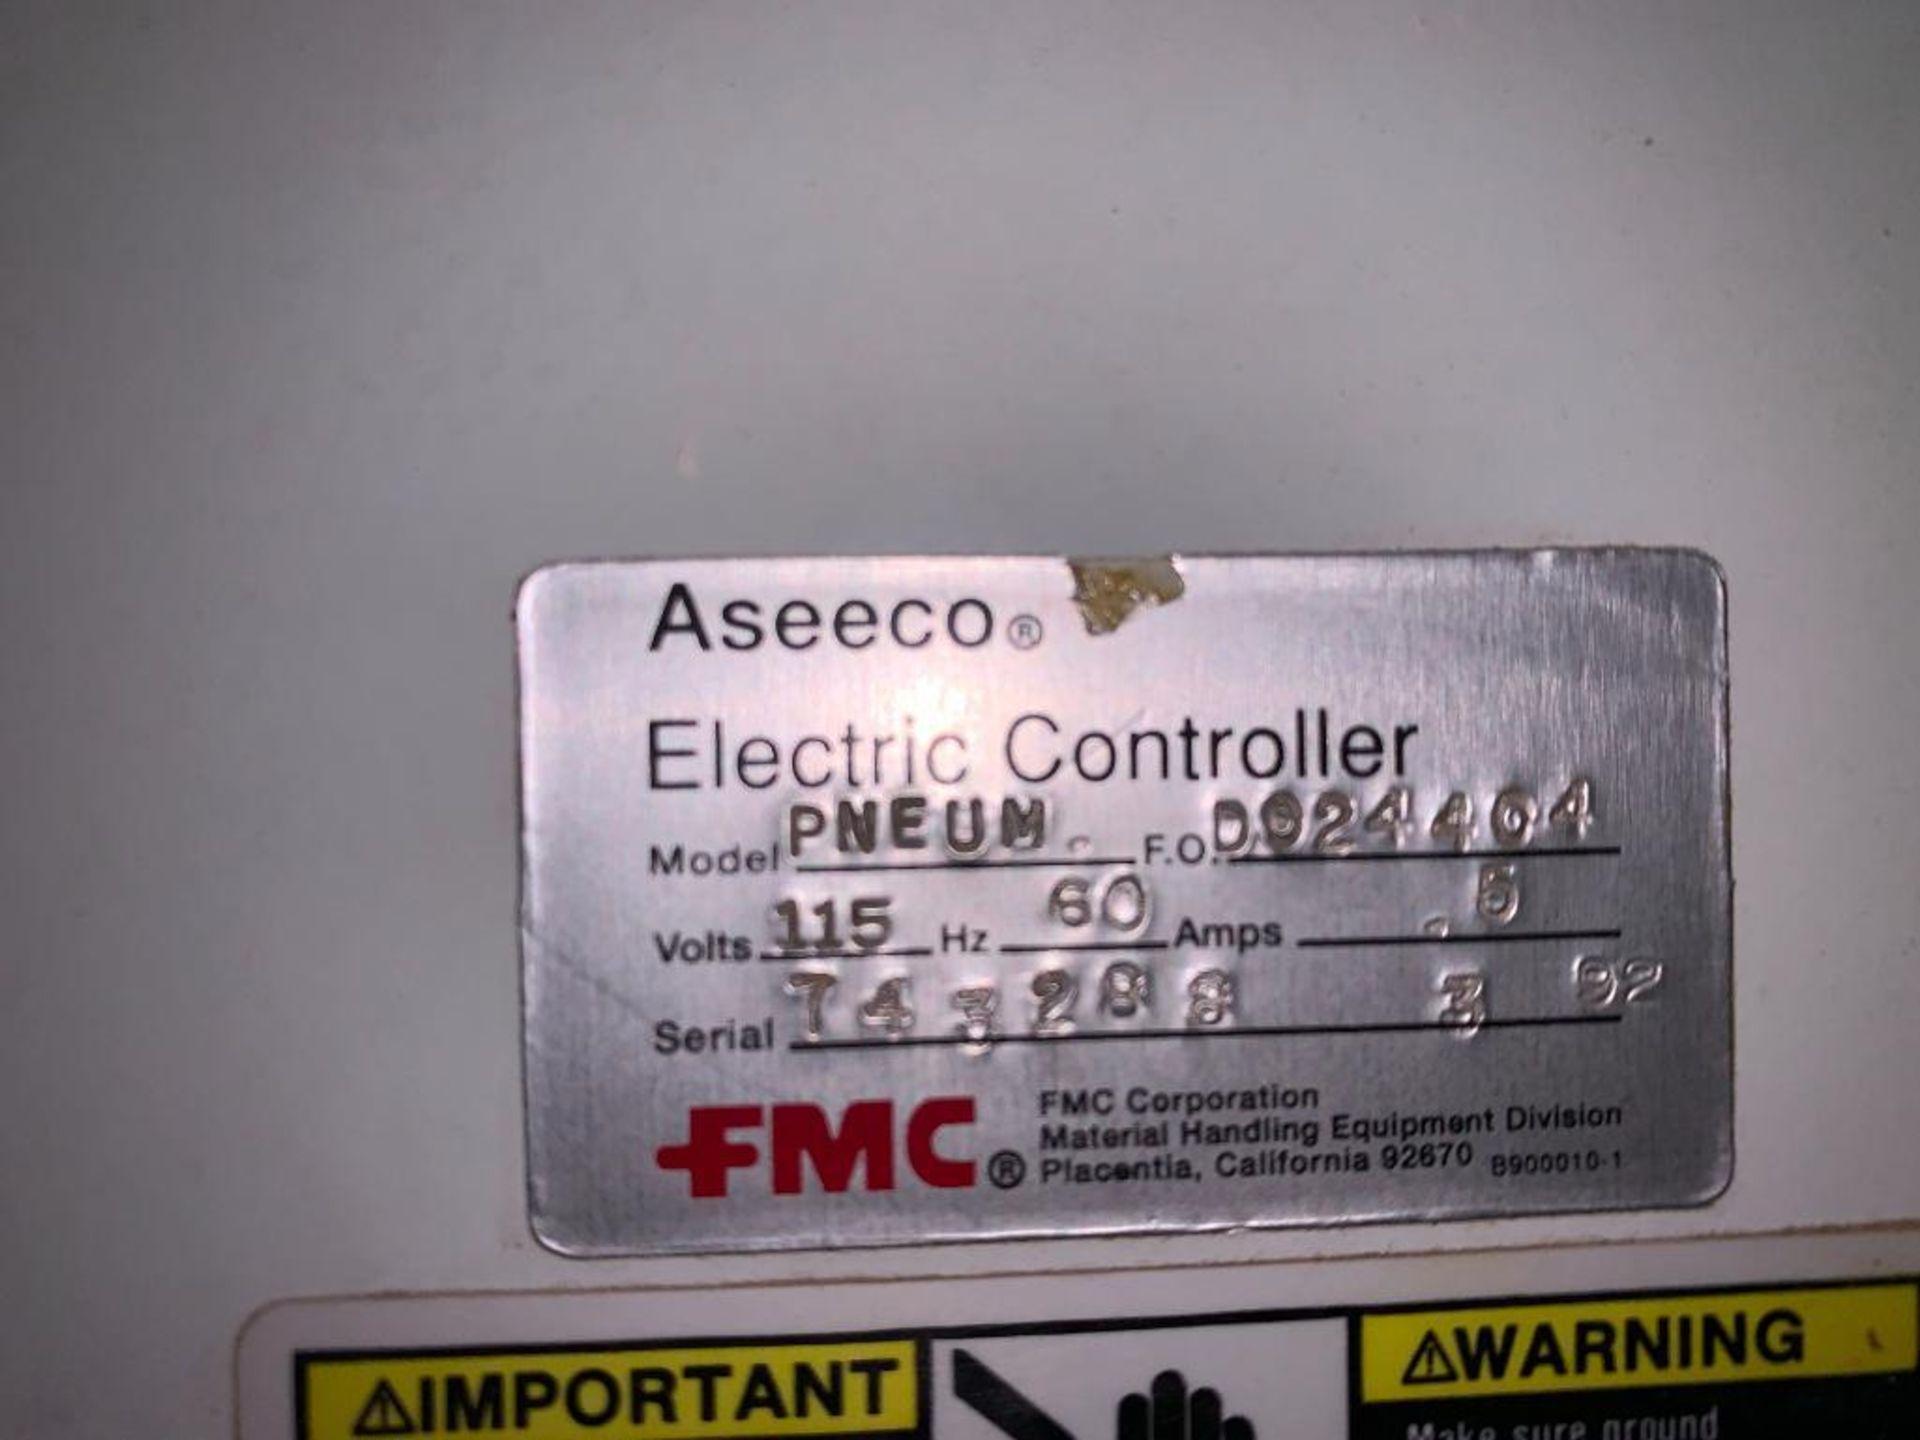 Aseeco mild steel cone bottom bulk storage bin - Image 26 of 27